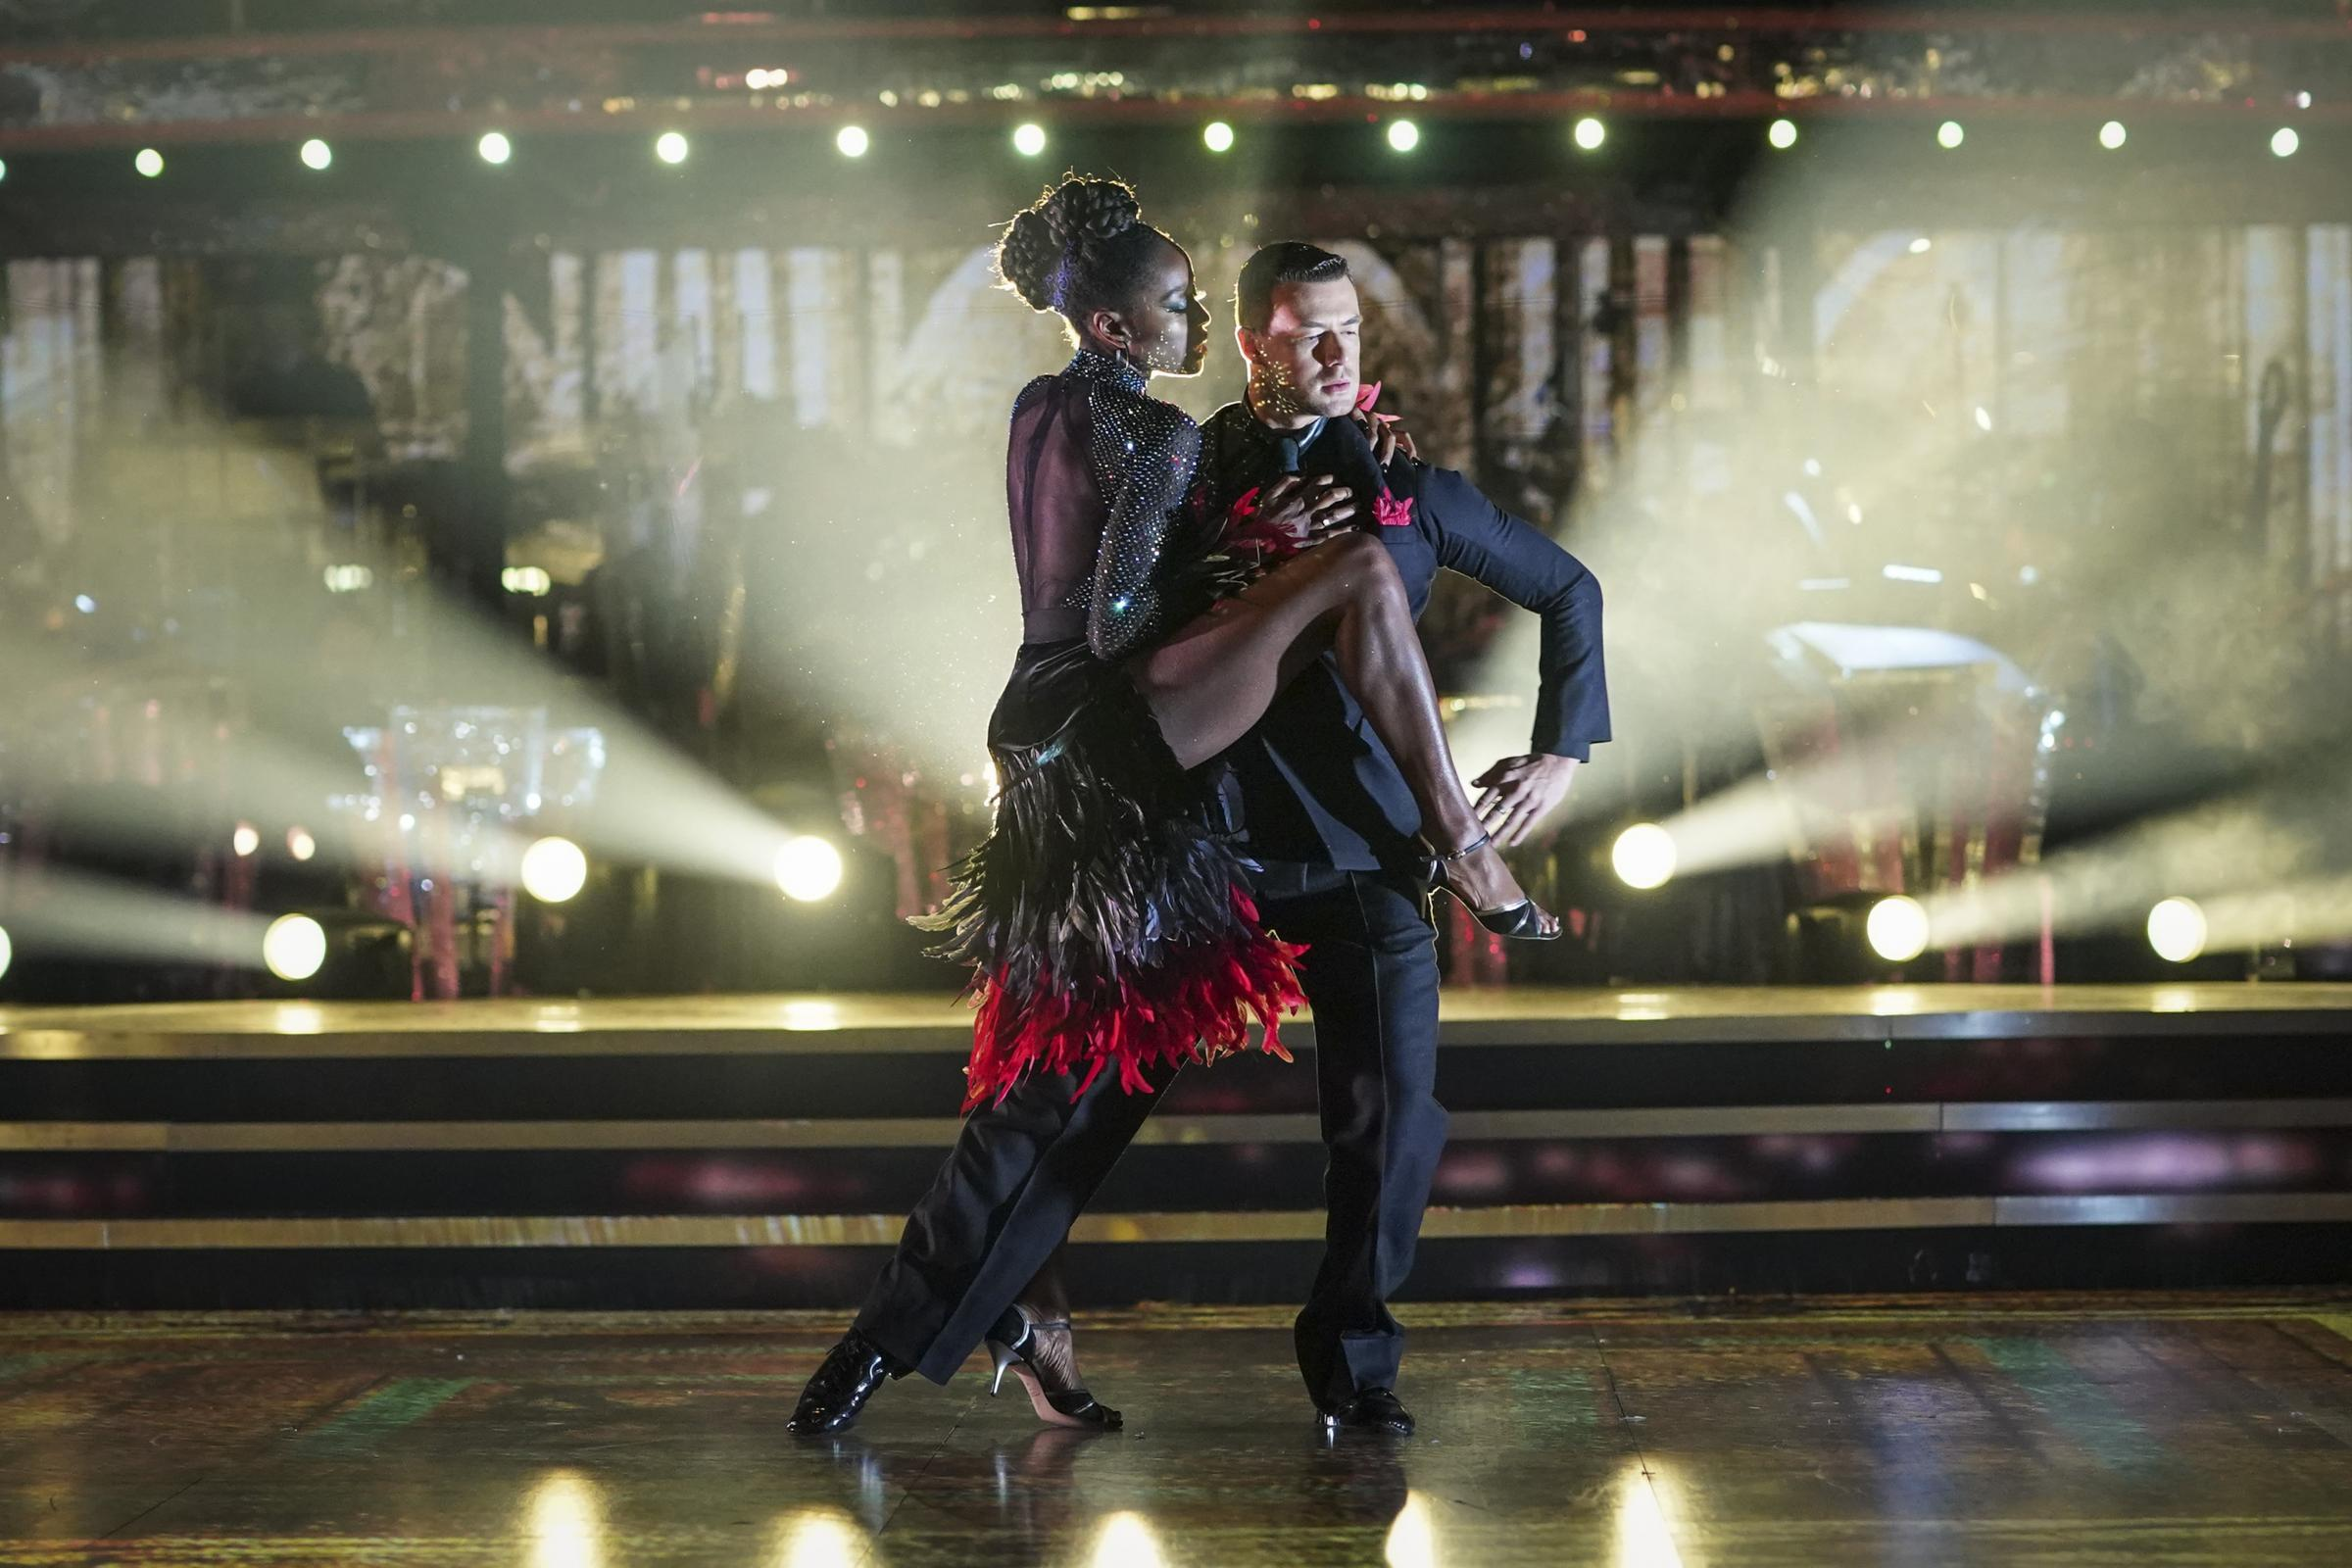 AJ Odudu Blackburn 'berkencan' Strictly Come Dancing partner